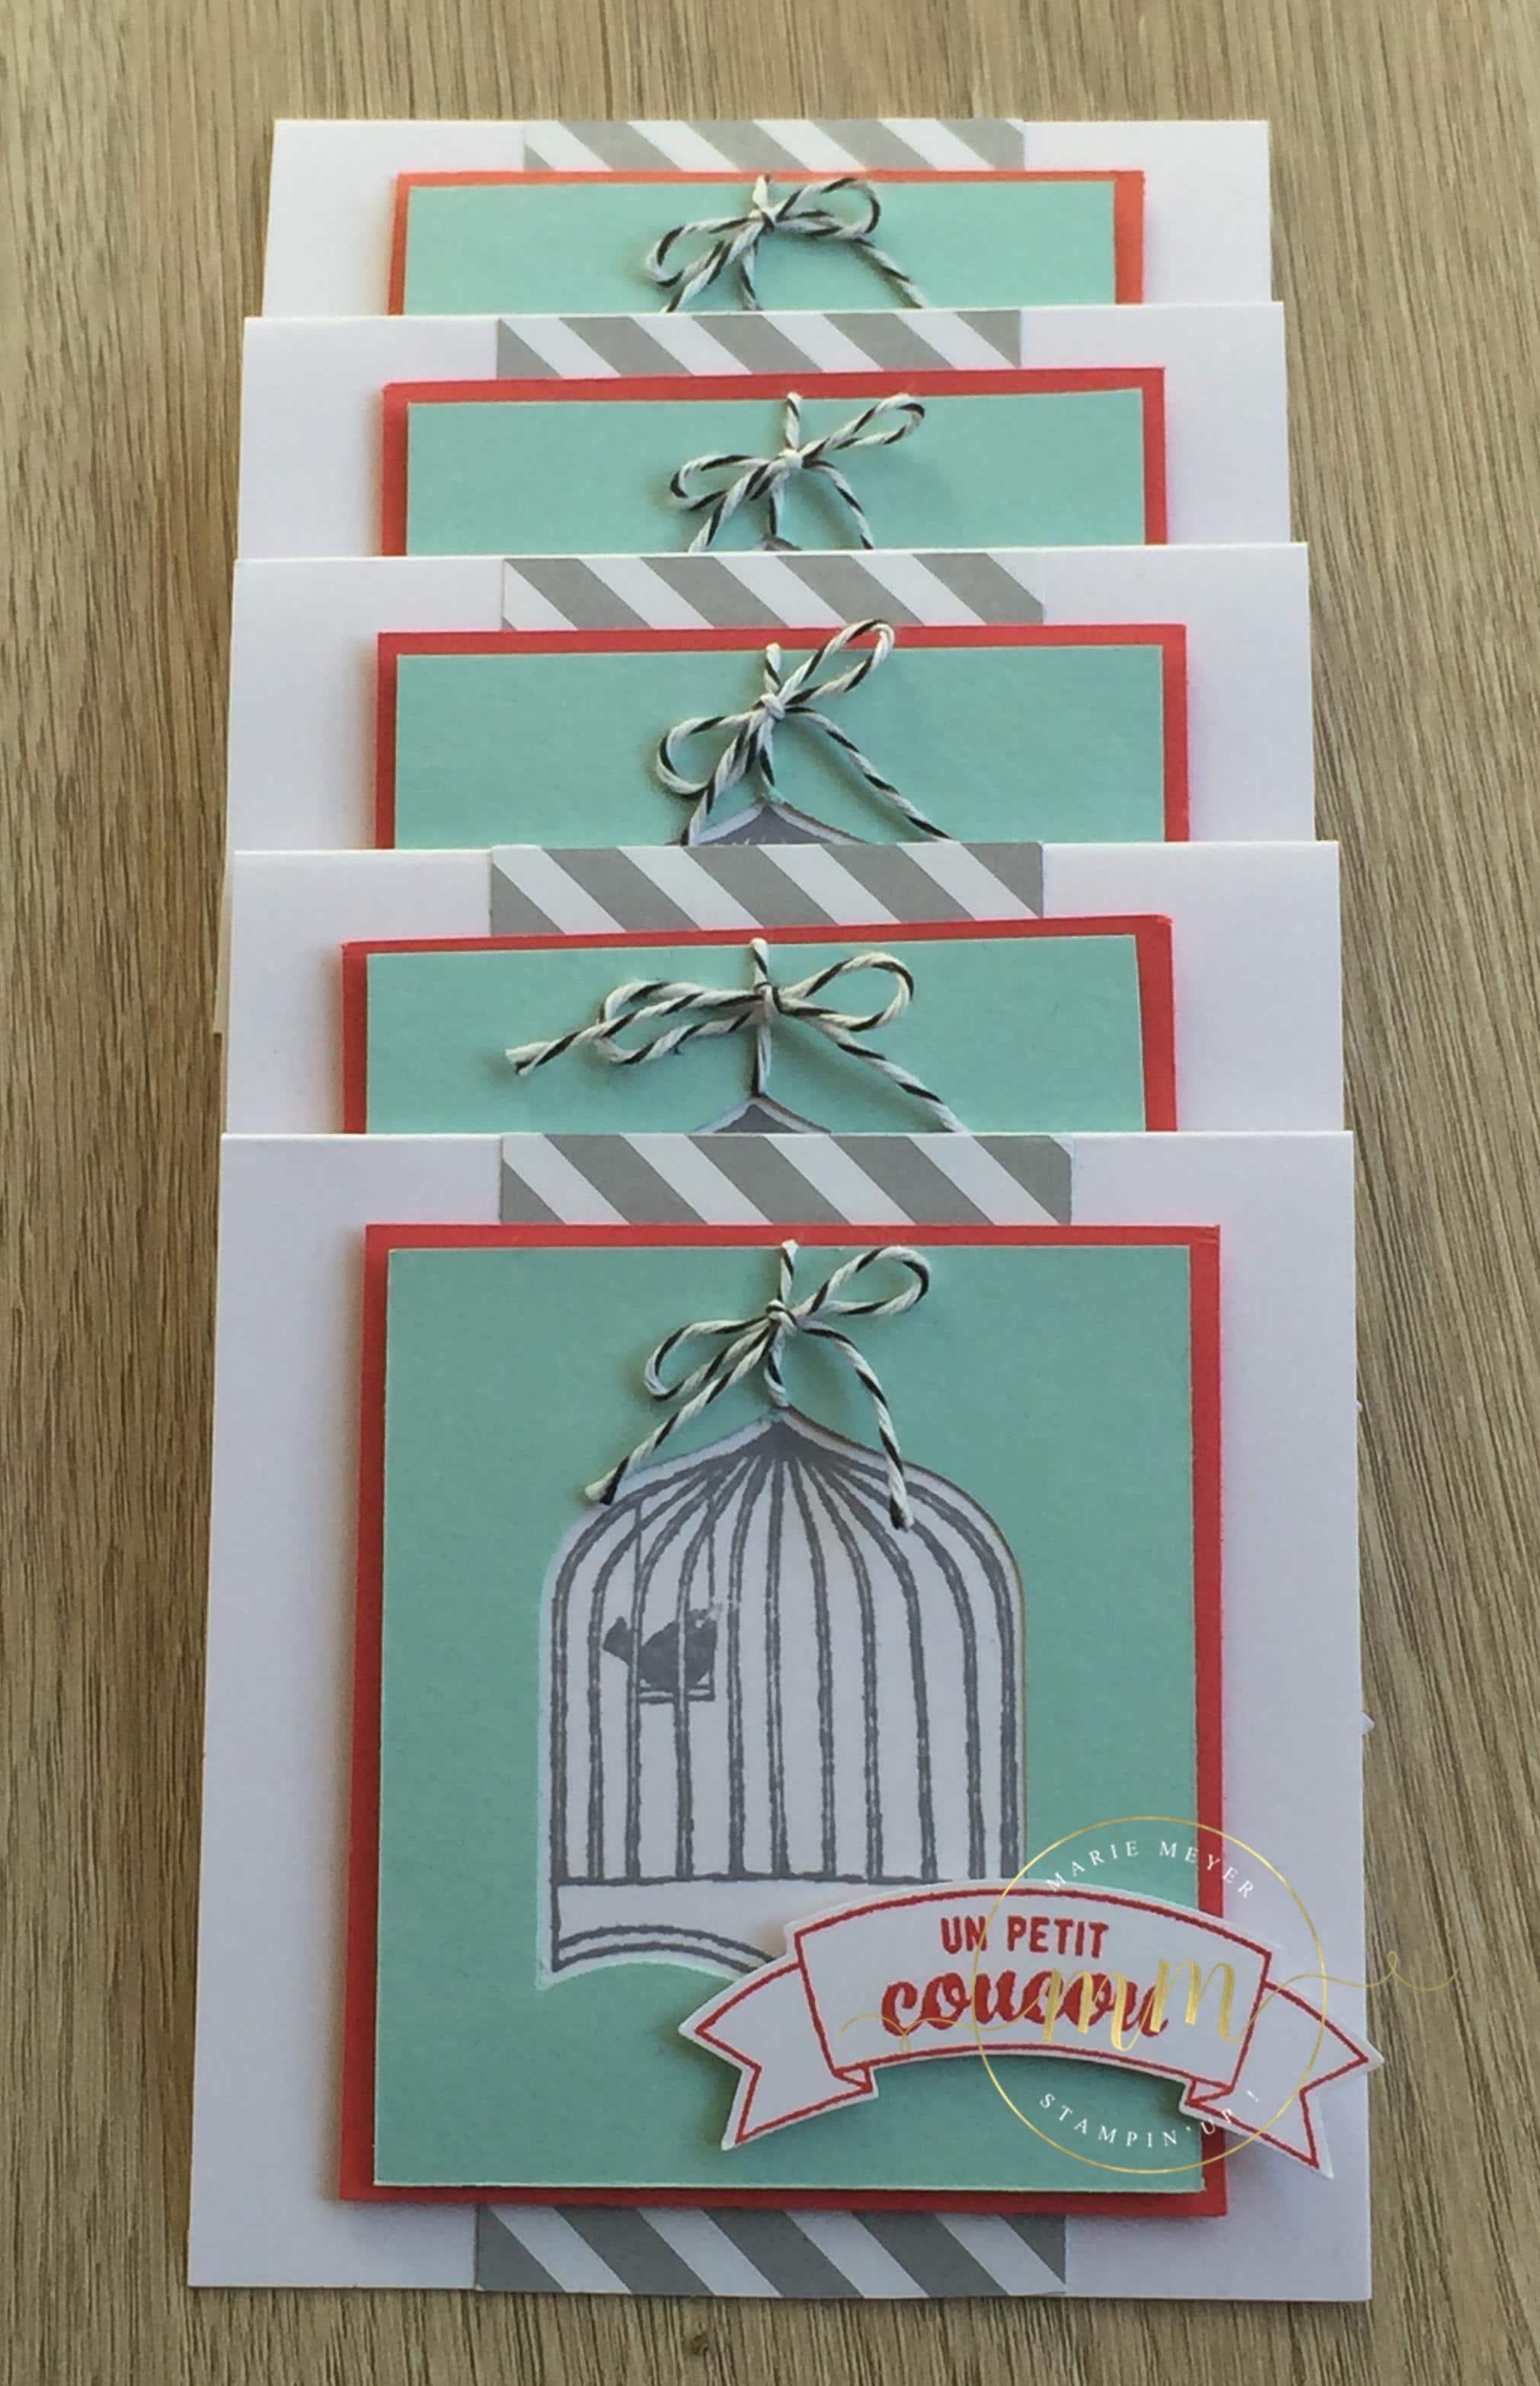 cartes-de-remerciements-badges-et-insignes-2016-2